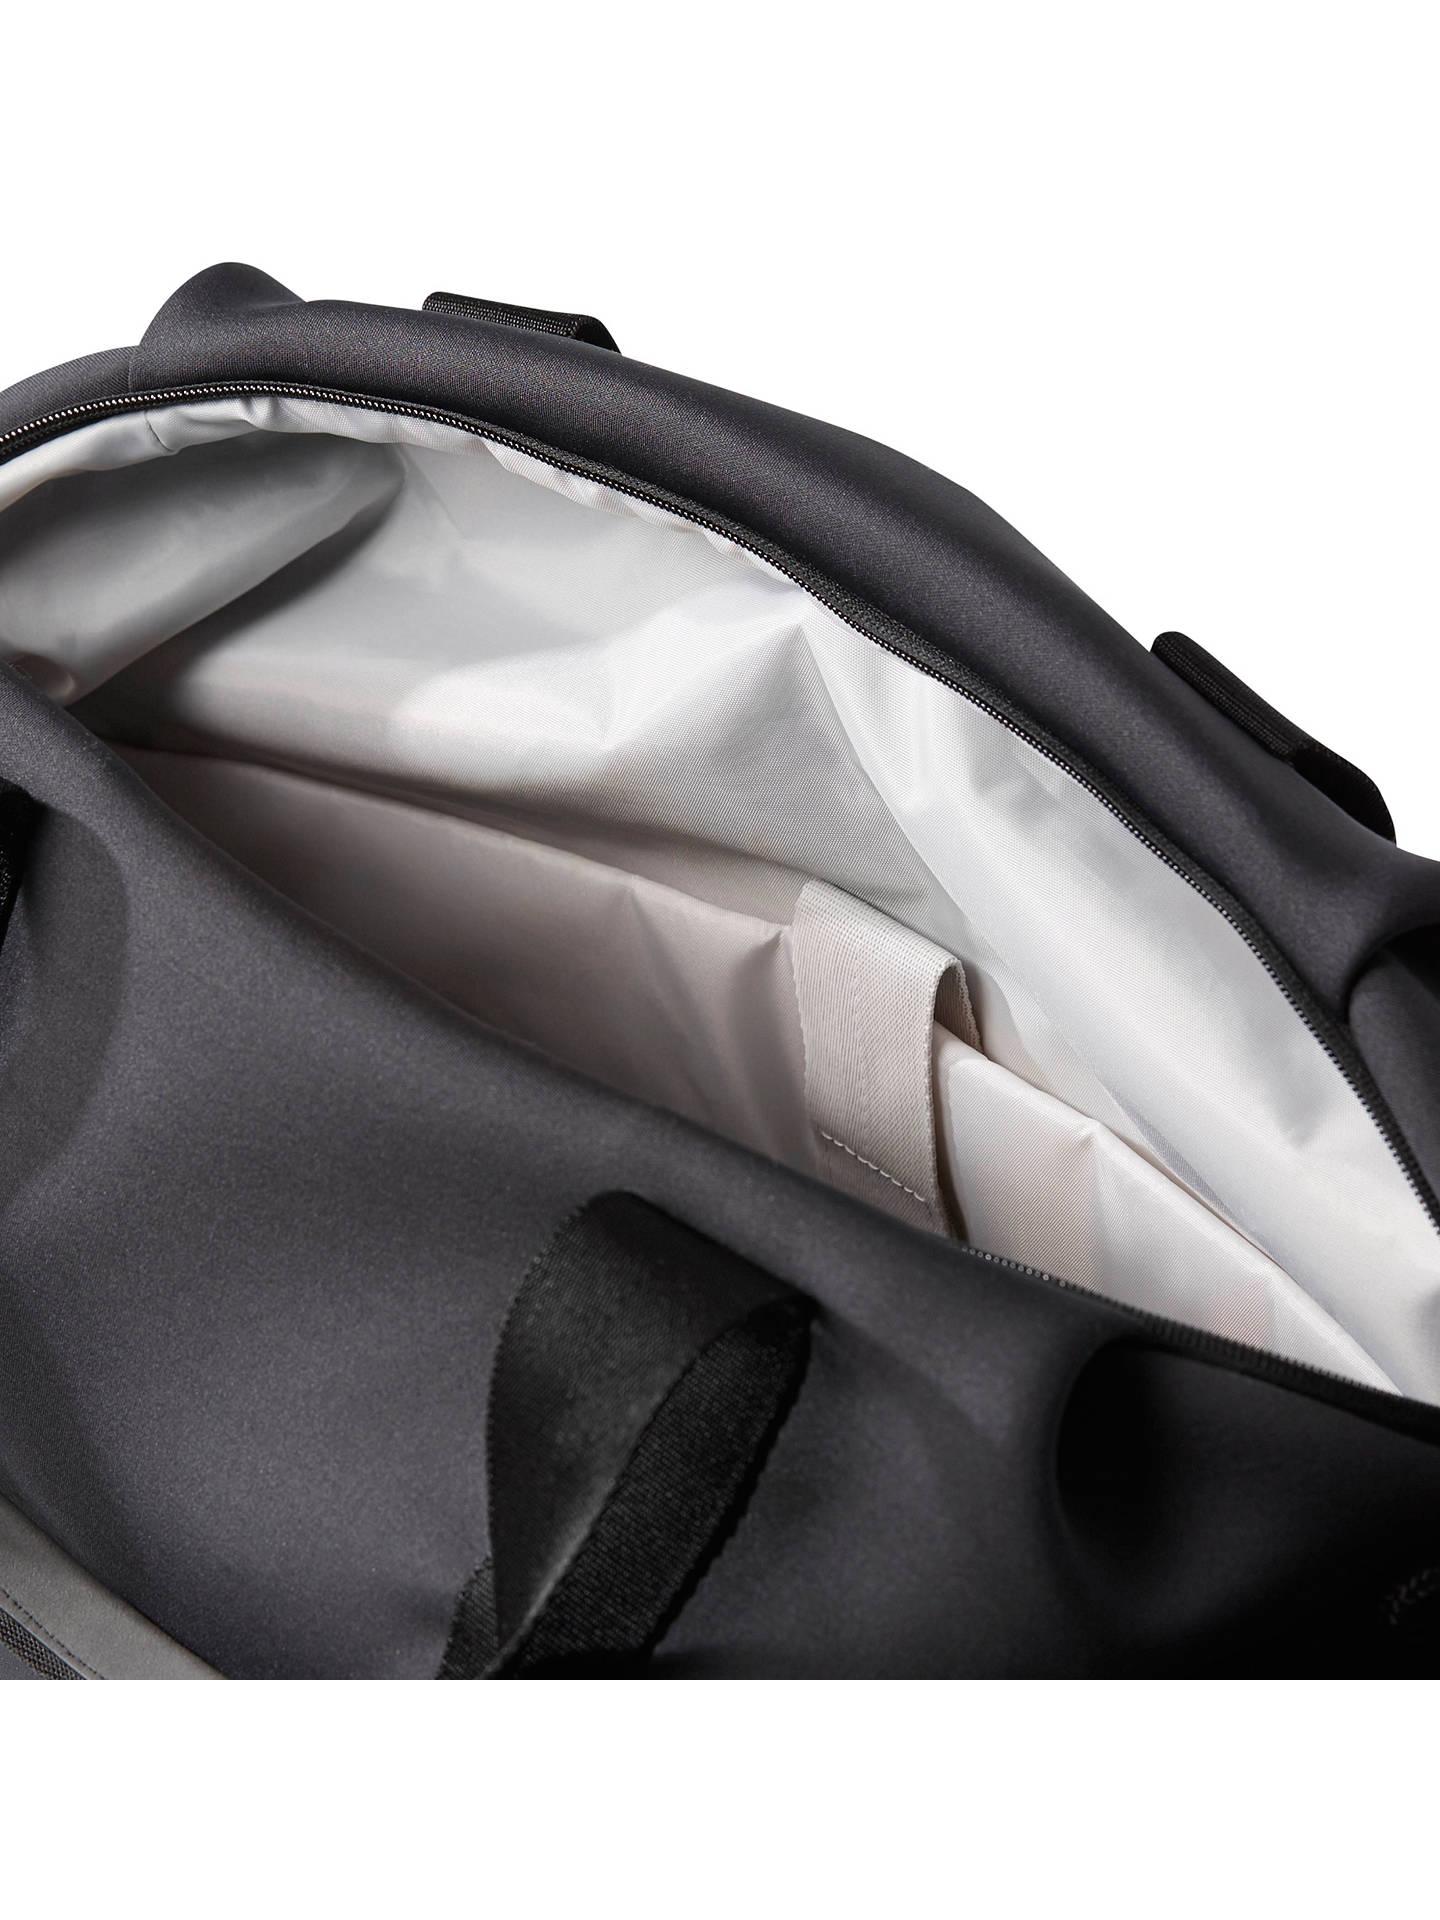 ... Buyadidas Tote Convertible Bag e0d35c92a812c